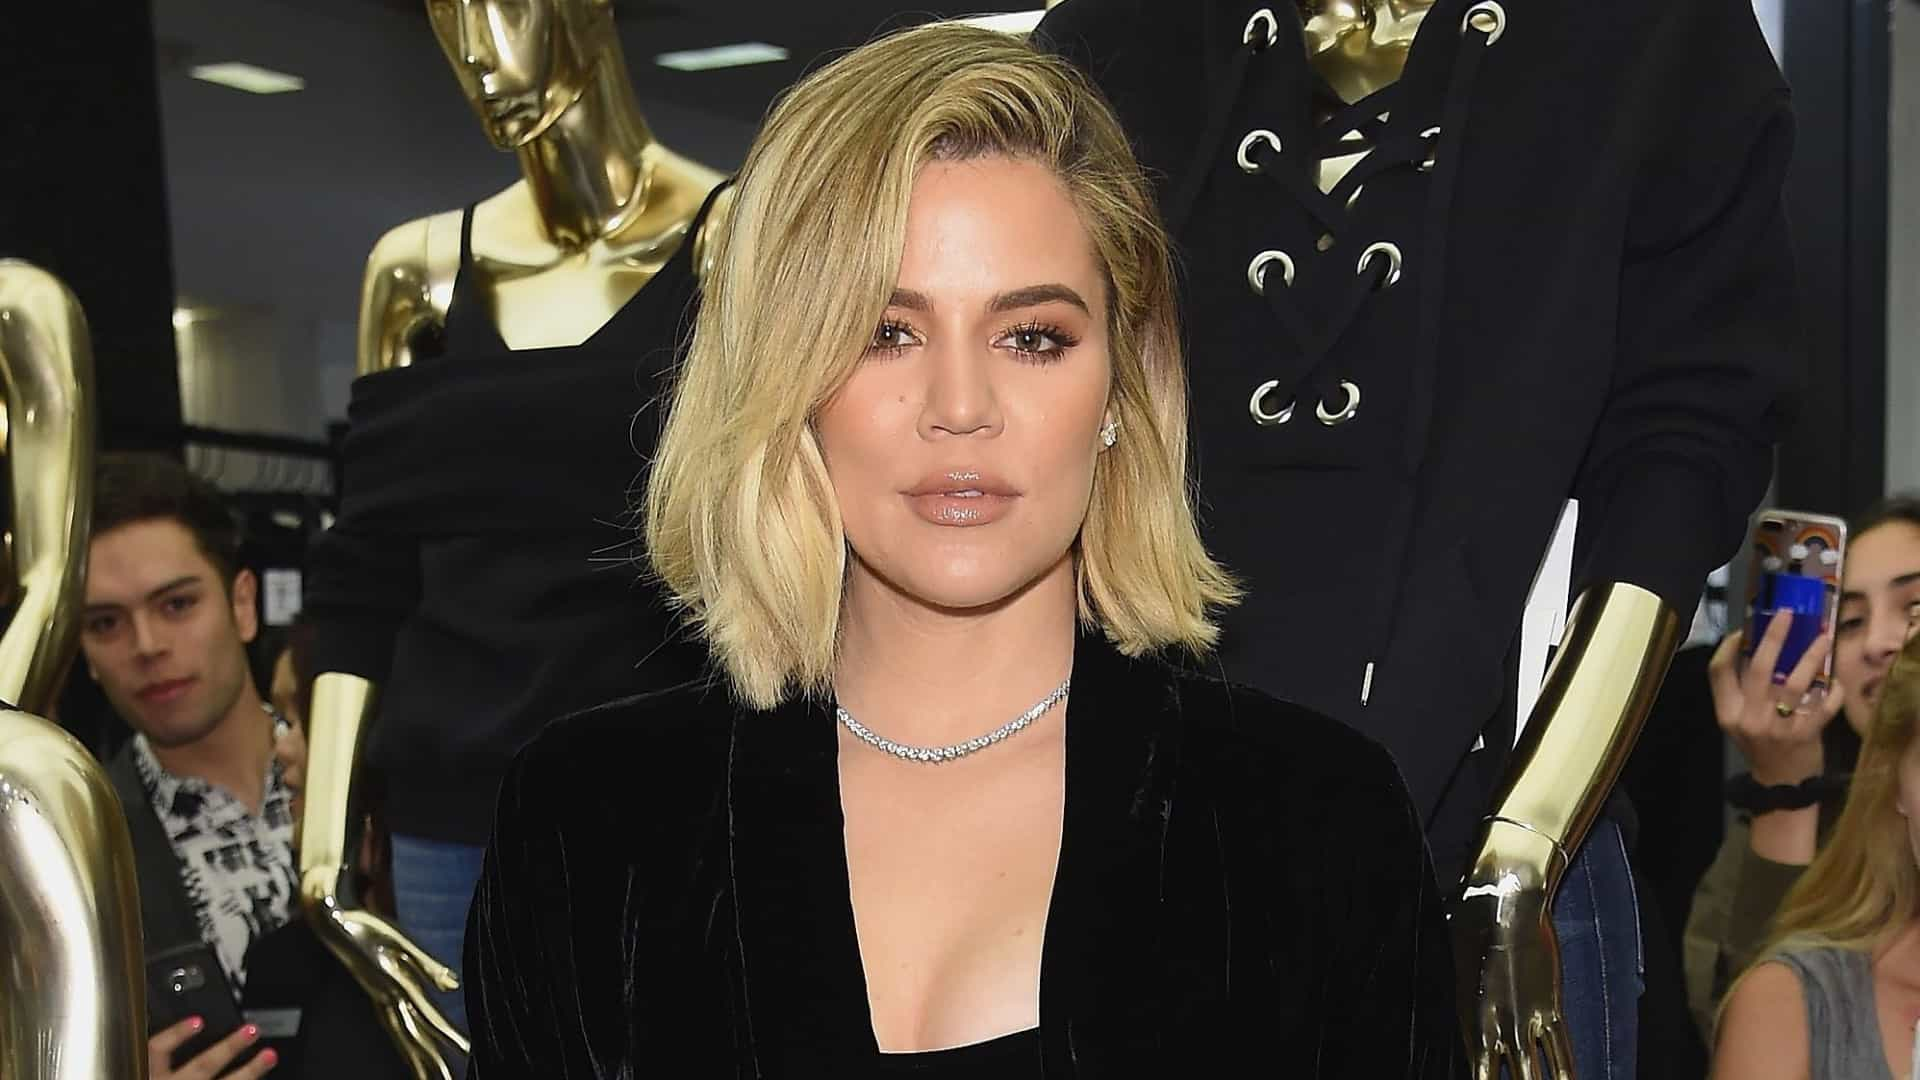 Khloé Kardashian guardará para sempre mágoa de Jordyn Woods